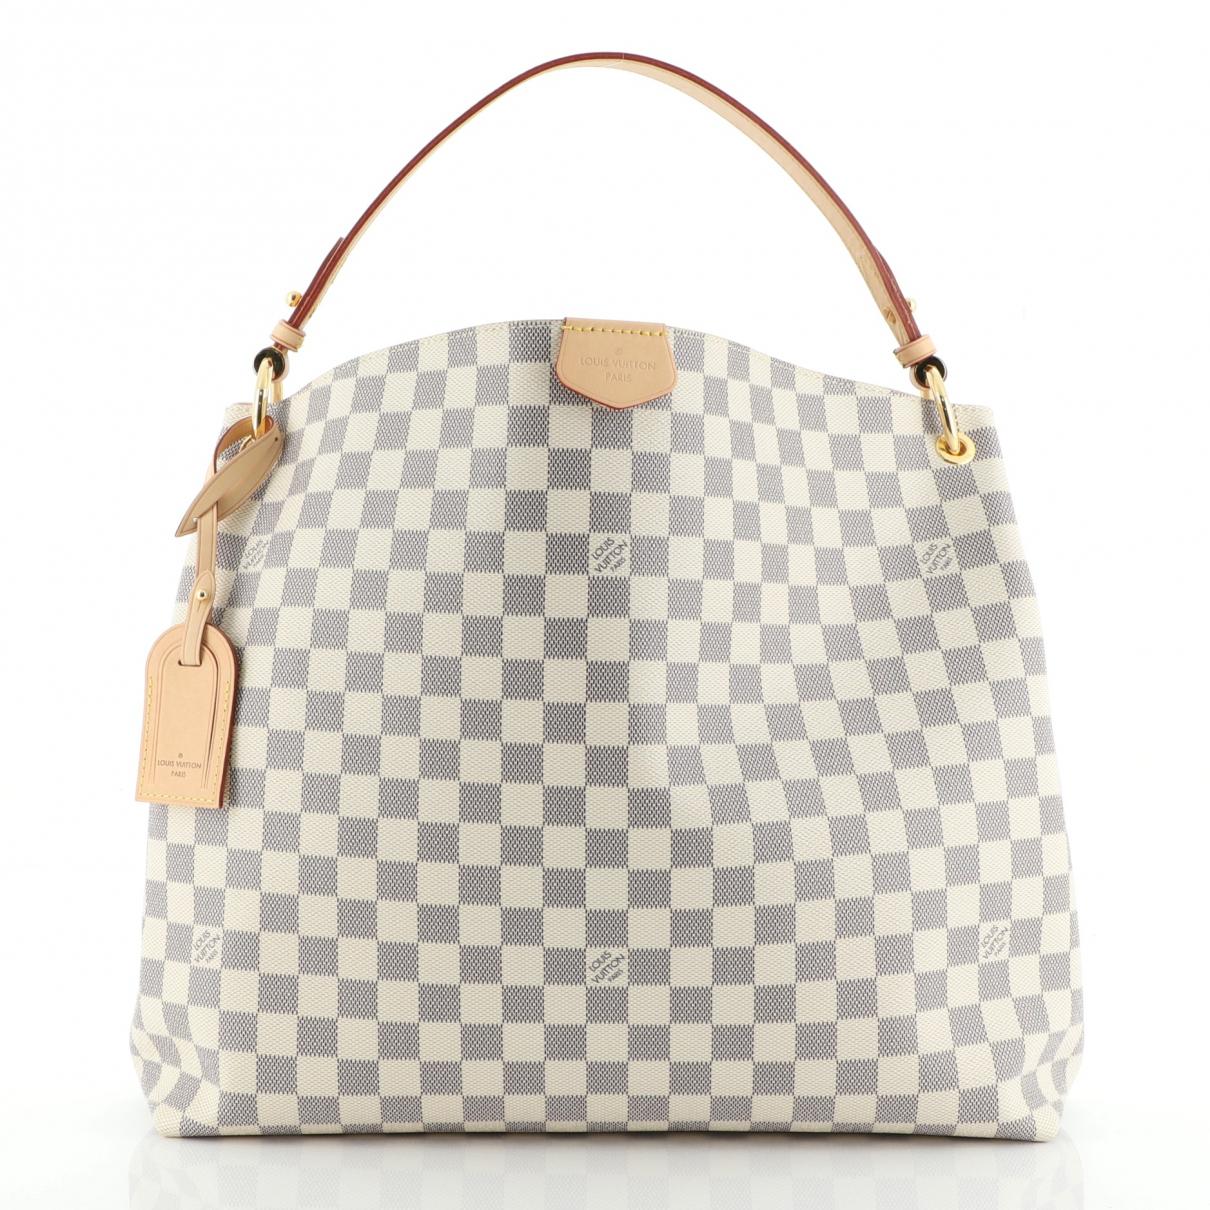 Louis Vuitton \N White Leather handbag for Women \N